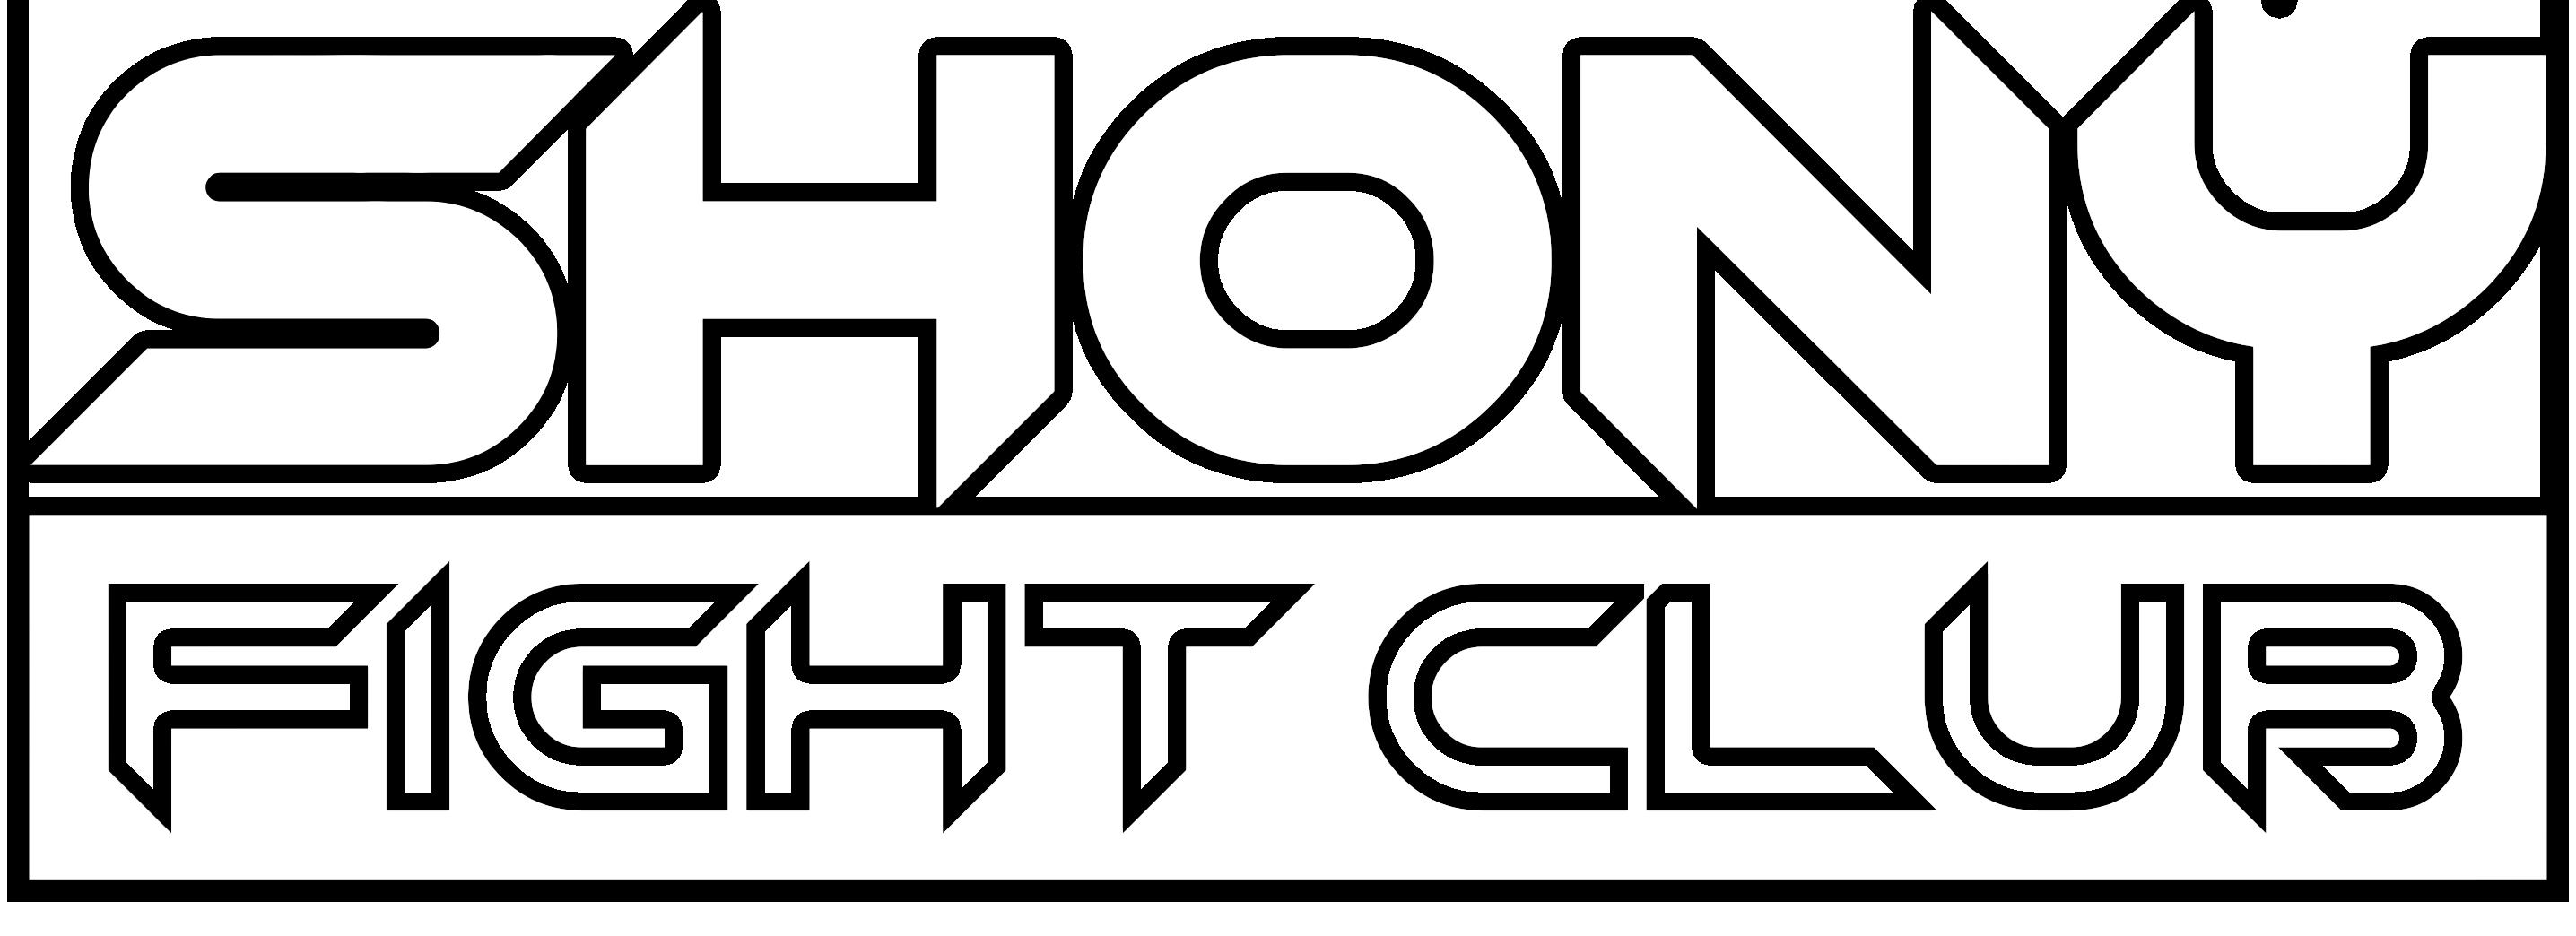 Fight Club Shony